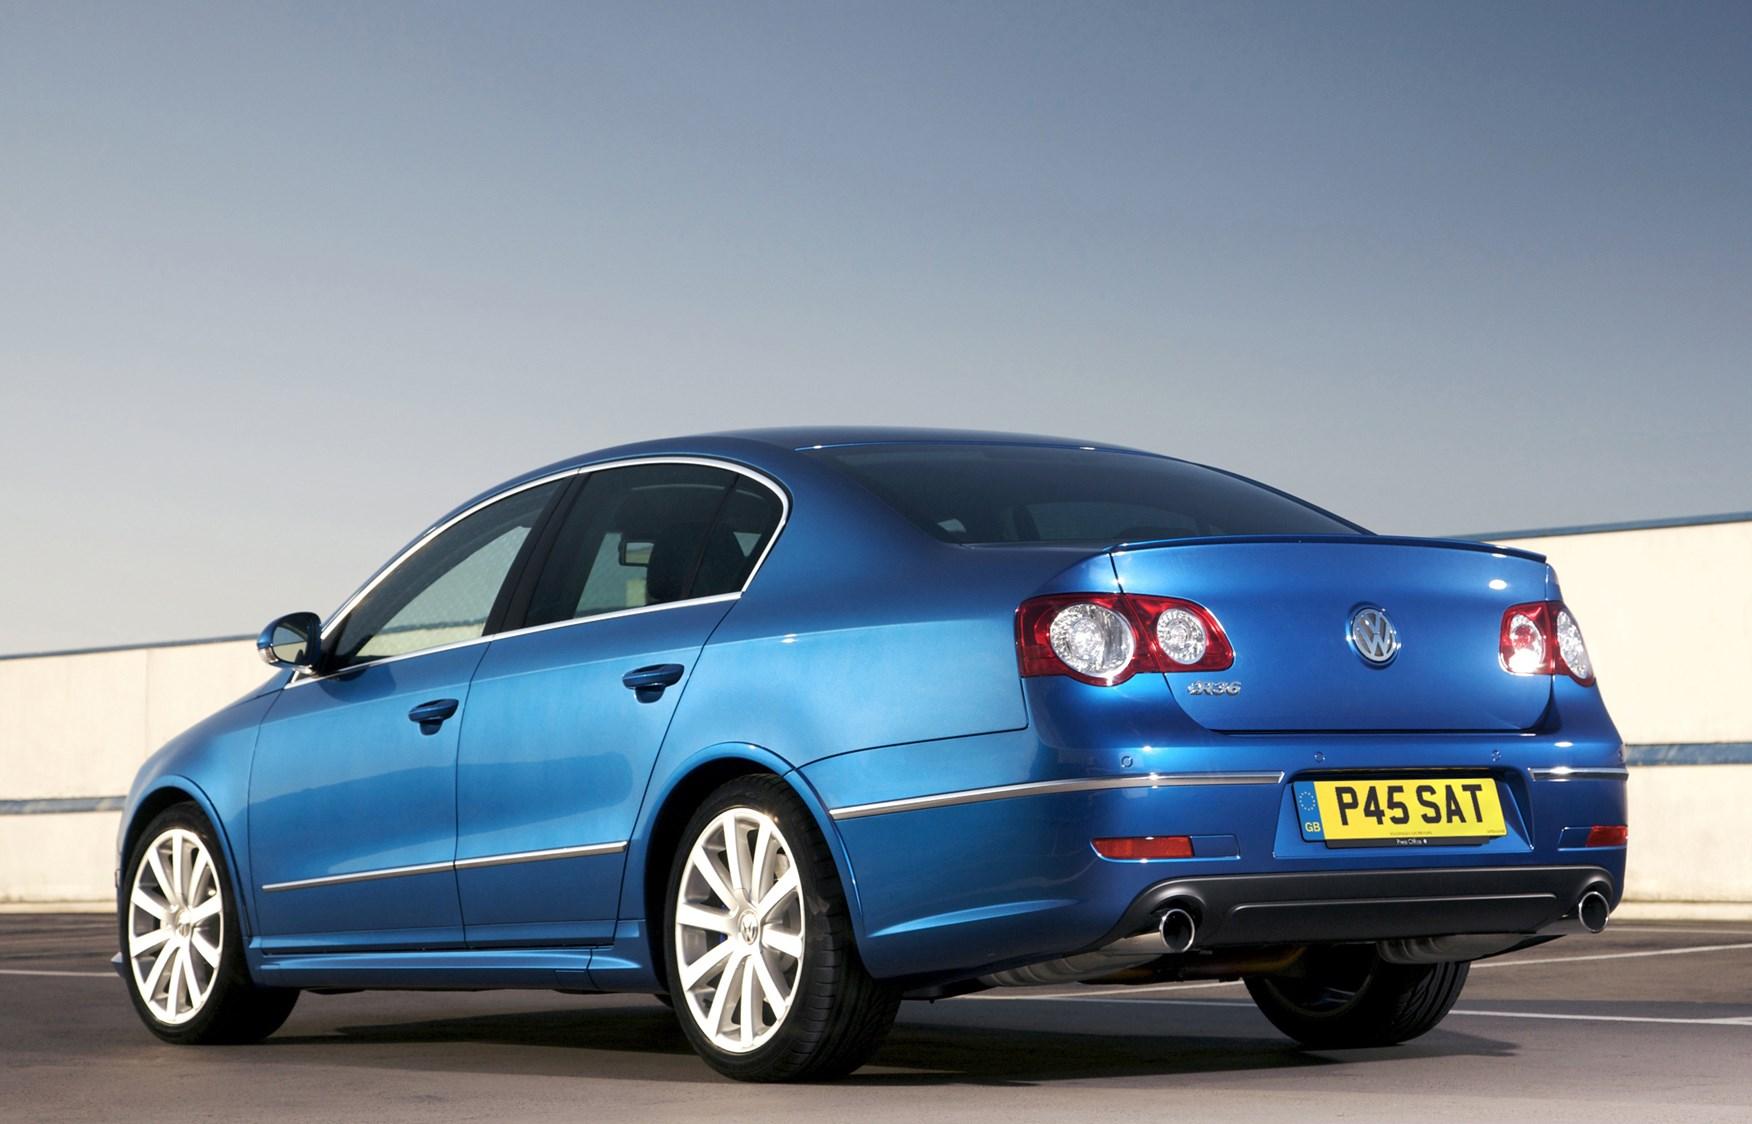 Used Volkswagen Passat R36 (2008 - 2010) Review | Parkers